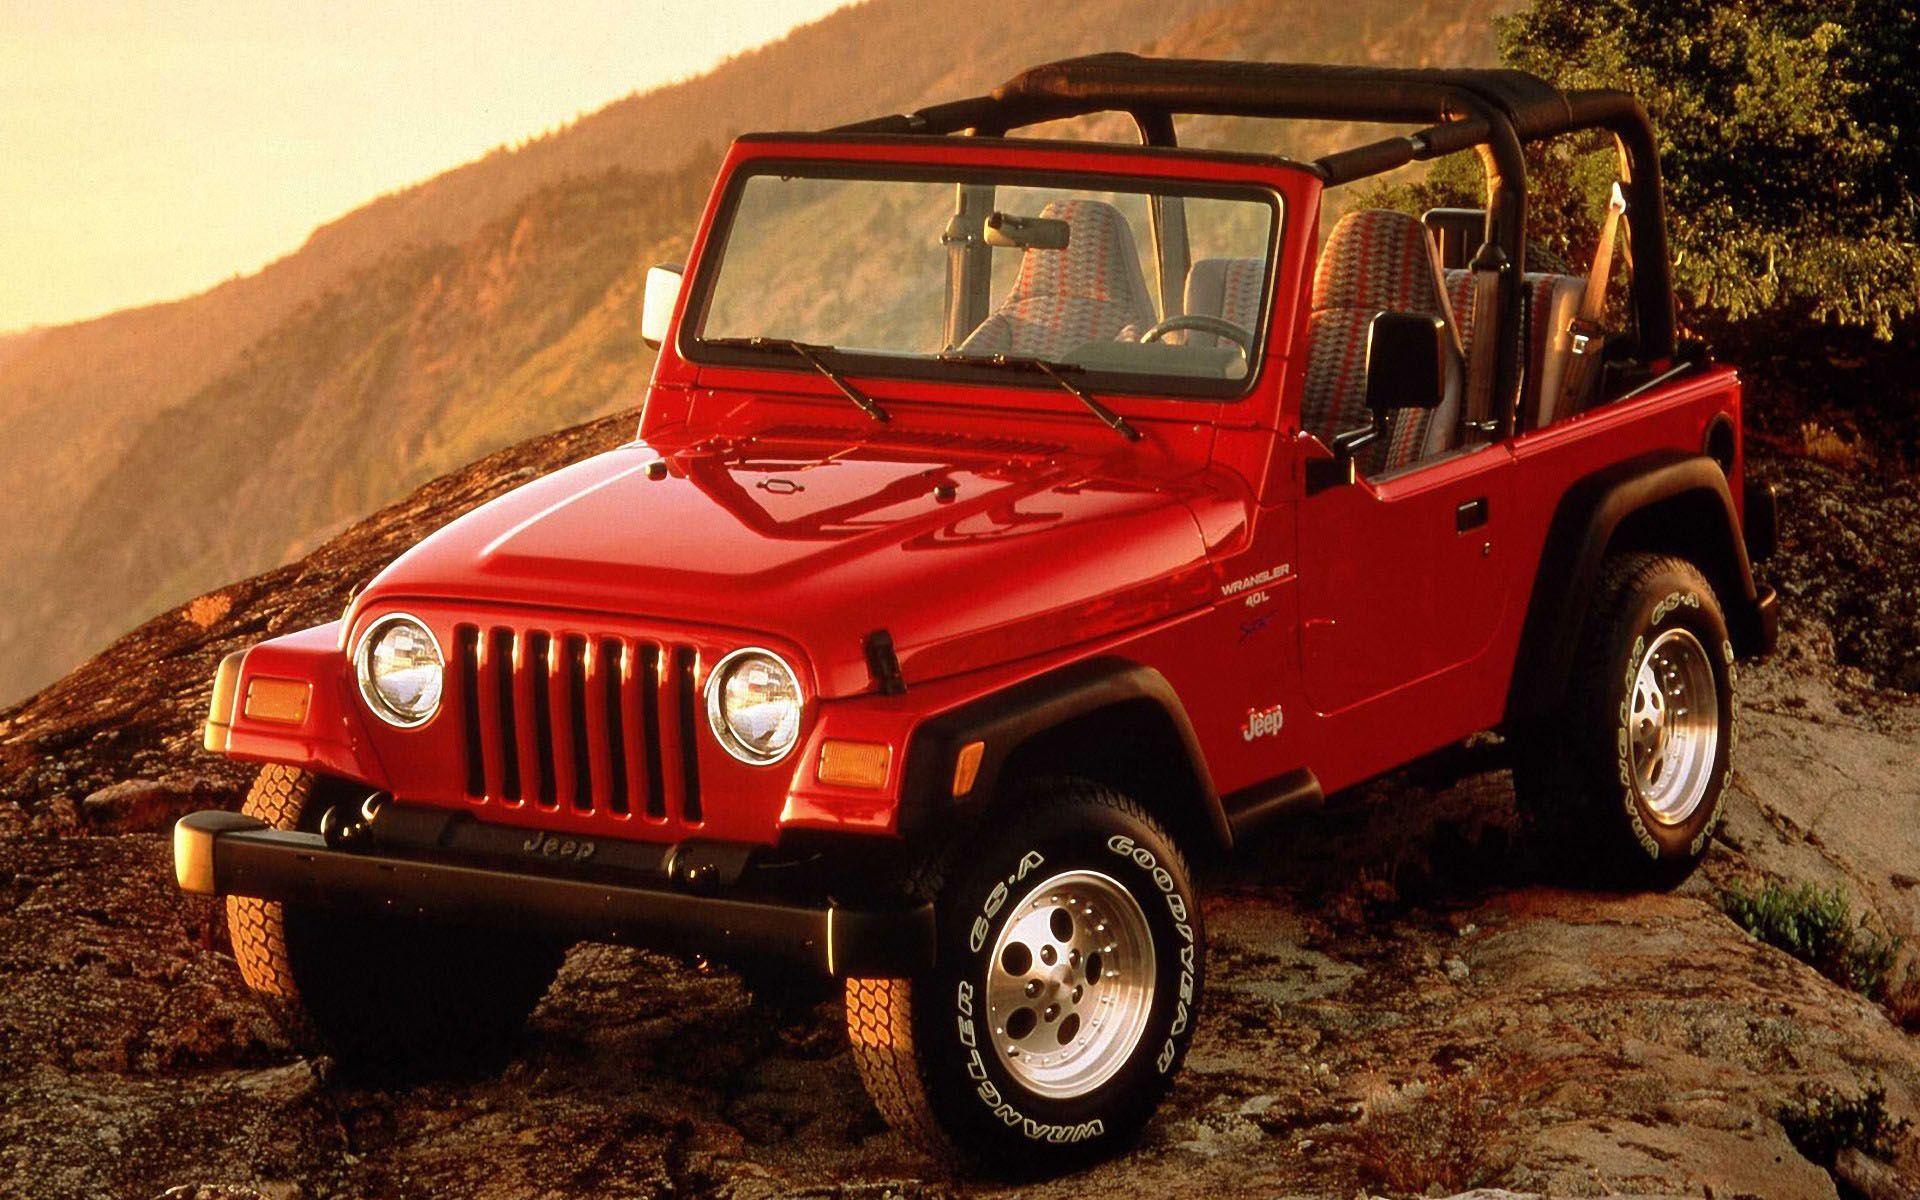 Pin By Teo Teo On Cars 1997 Jeep Wrangler 1999 Jeep Wrangler